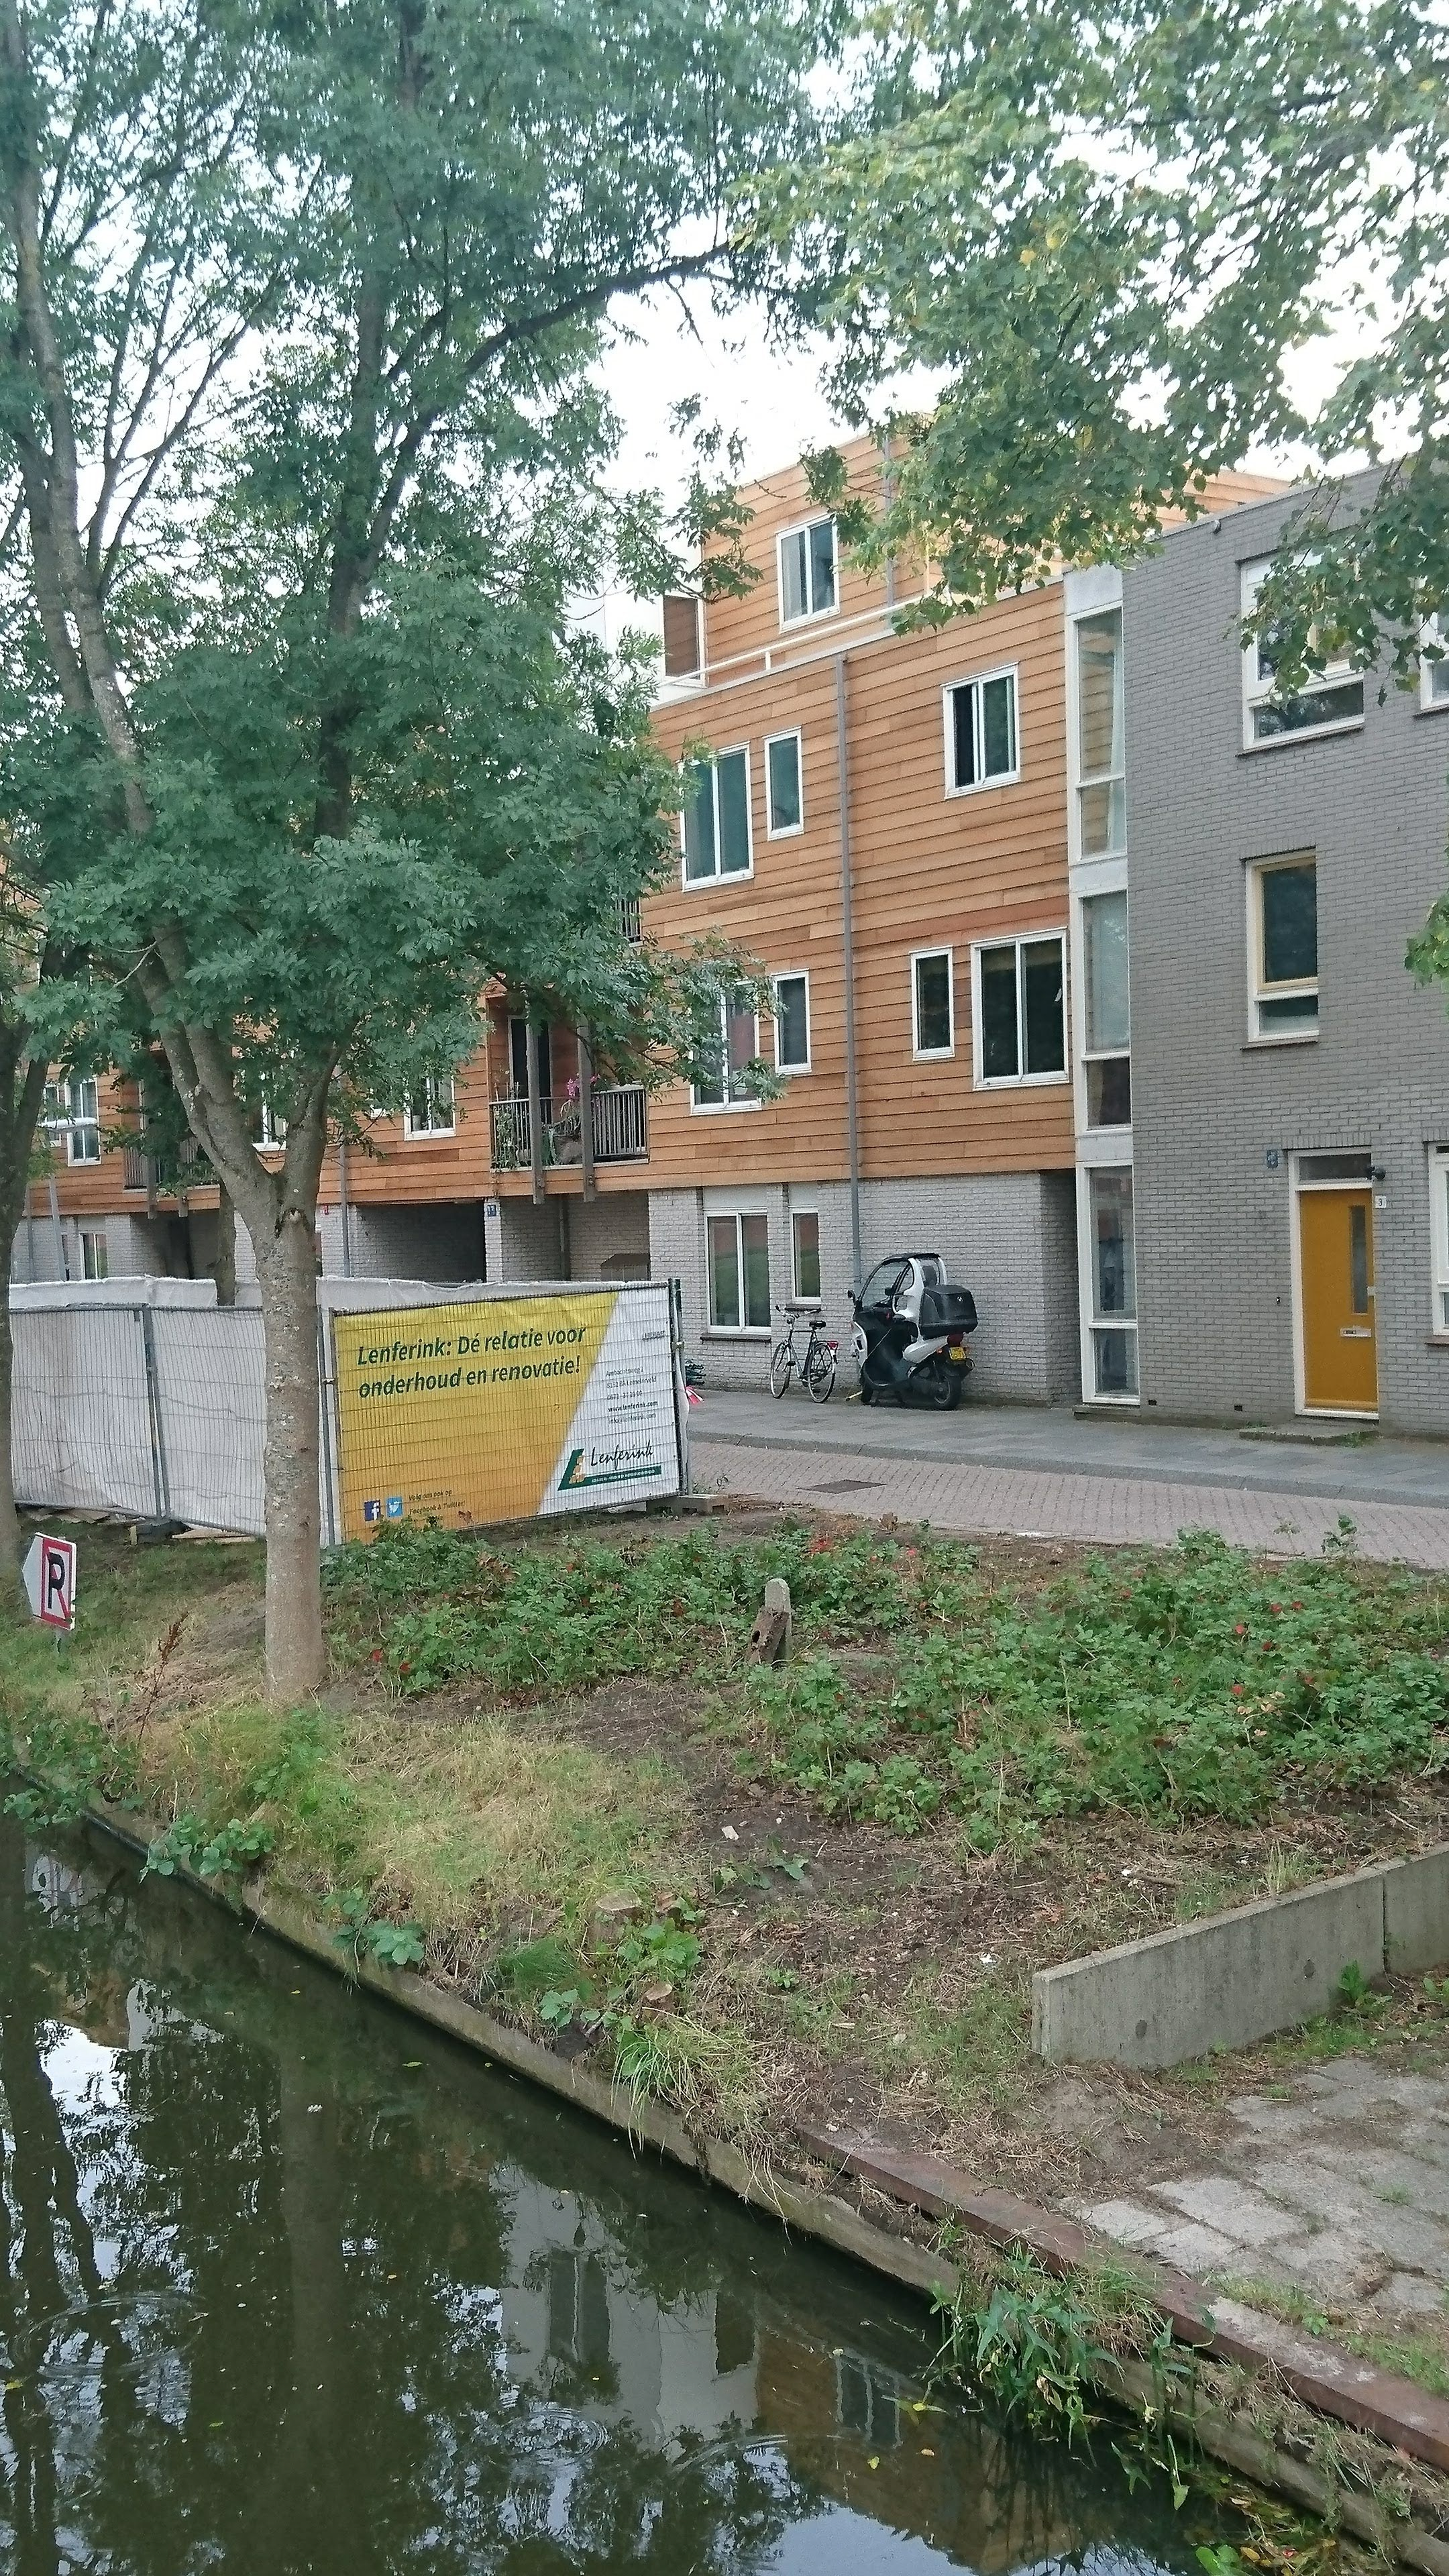 Onderhoud Marwixkade flats